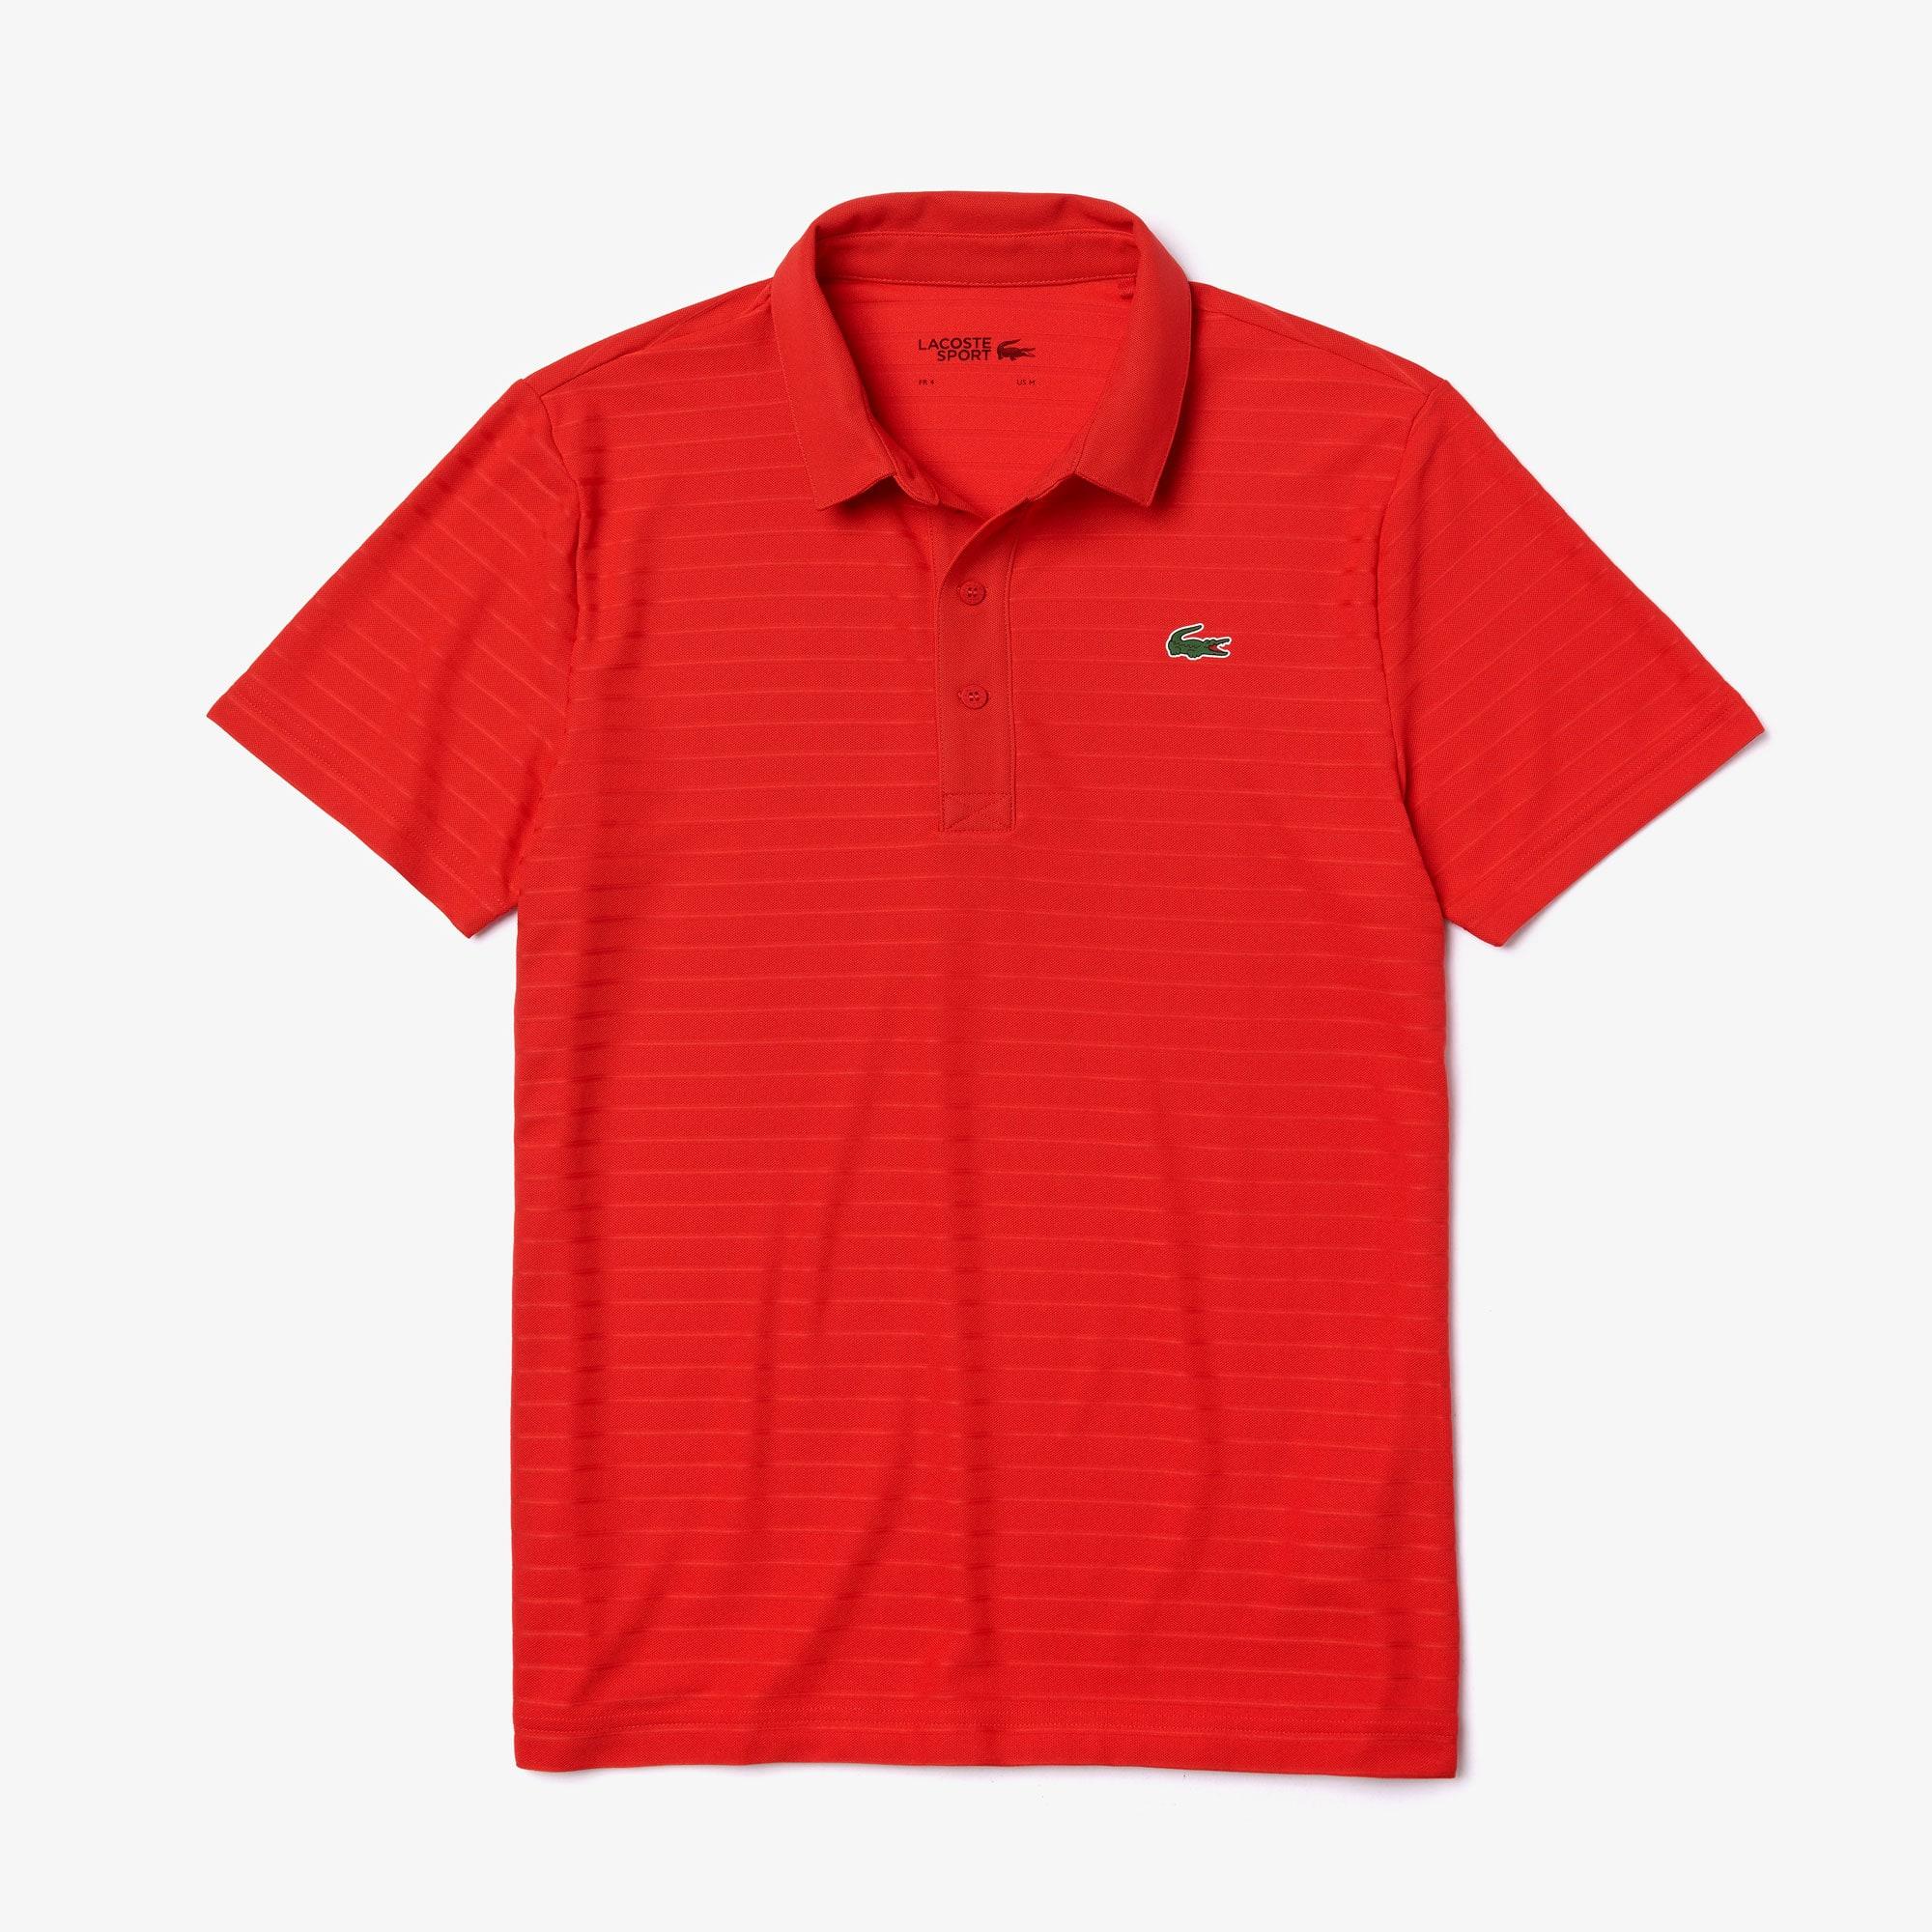 Lacoste Mens Sport Short Sleeve Jacquard Techincal Polo Shirt